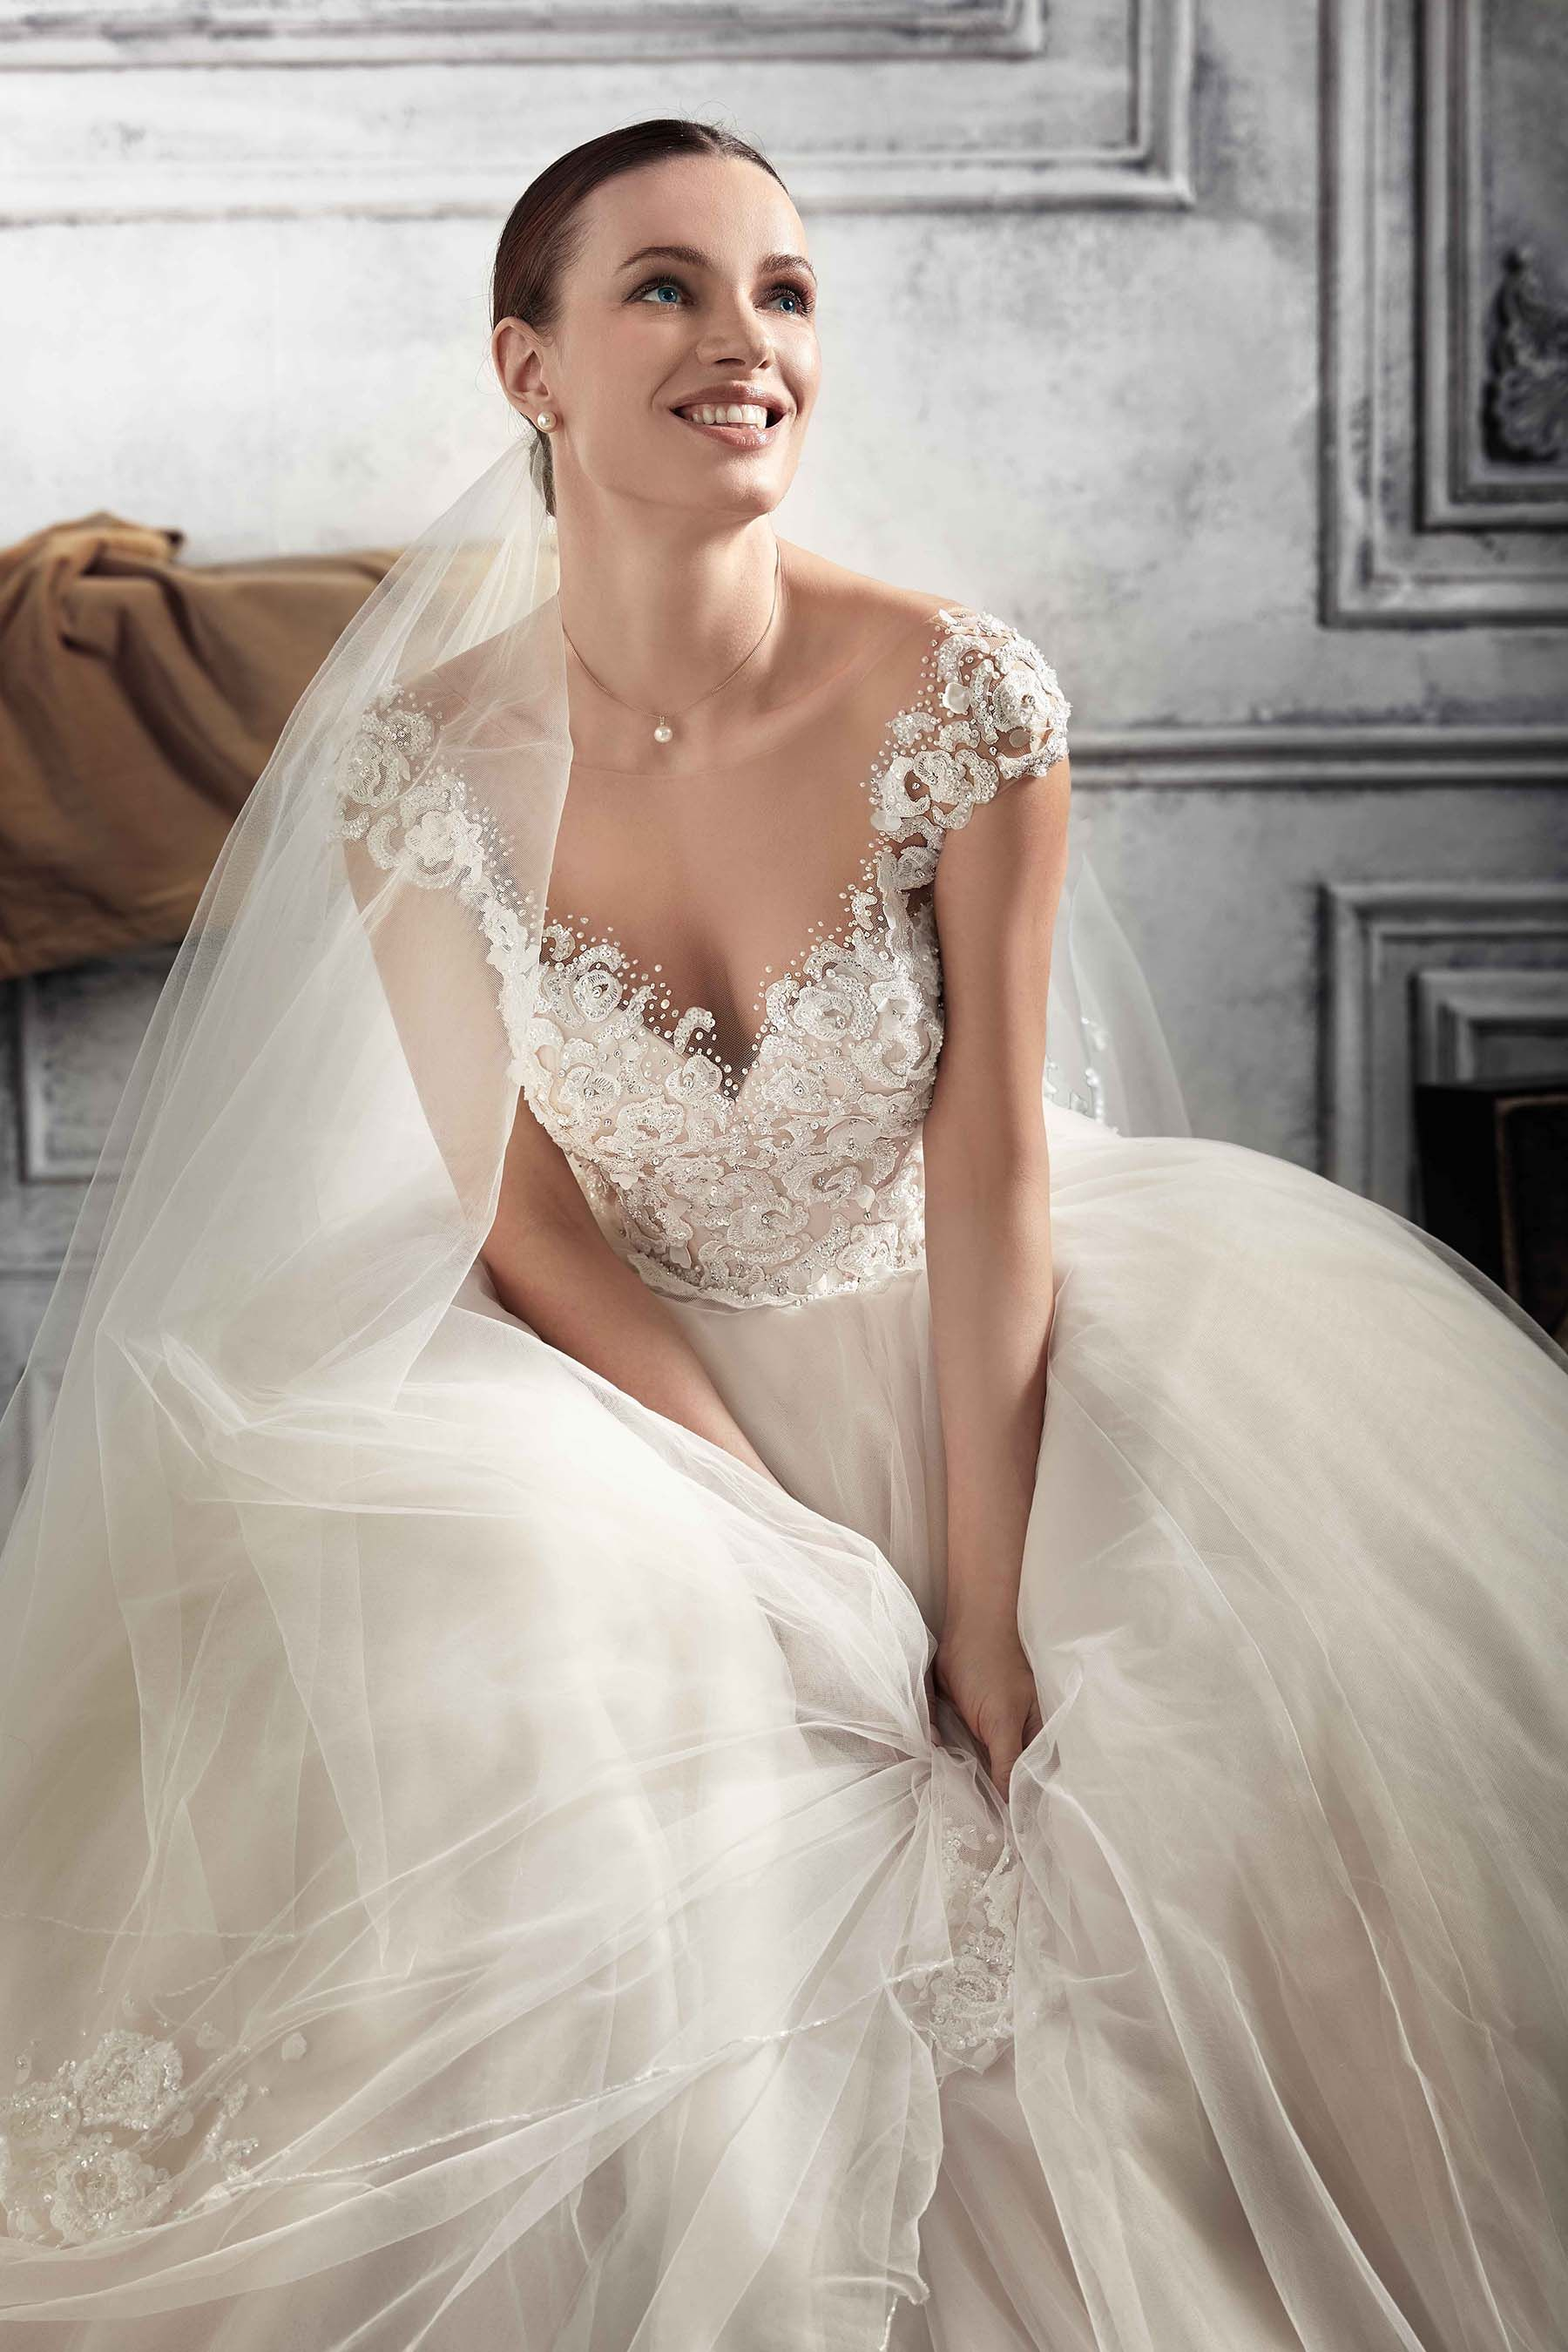 Style 808 wide skirt view   Demetrios 2018/2017   Pinterest